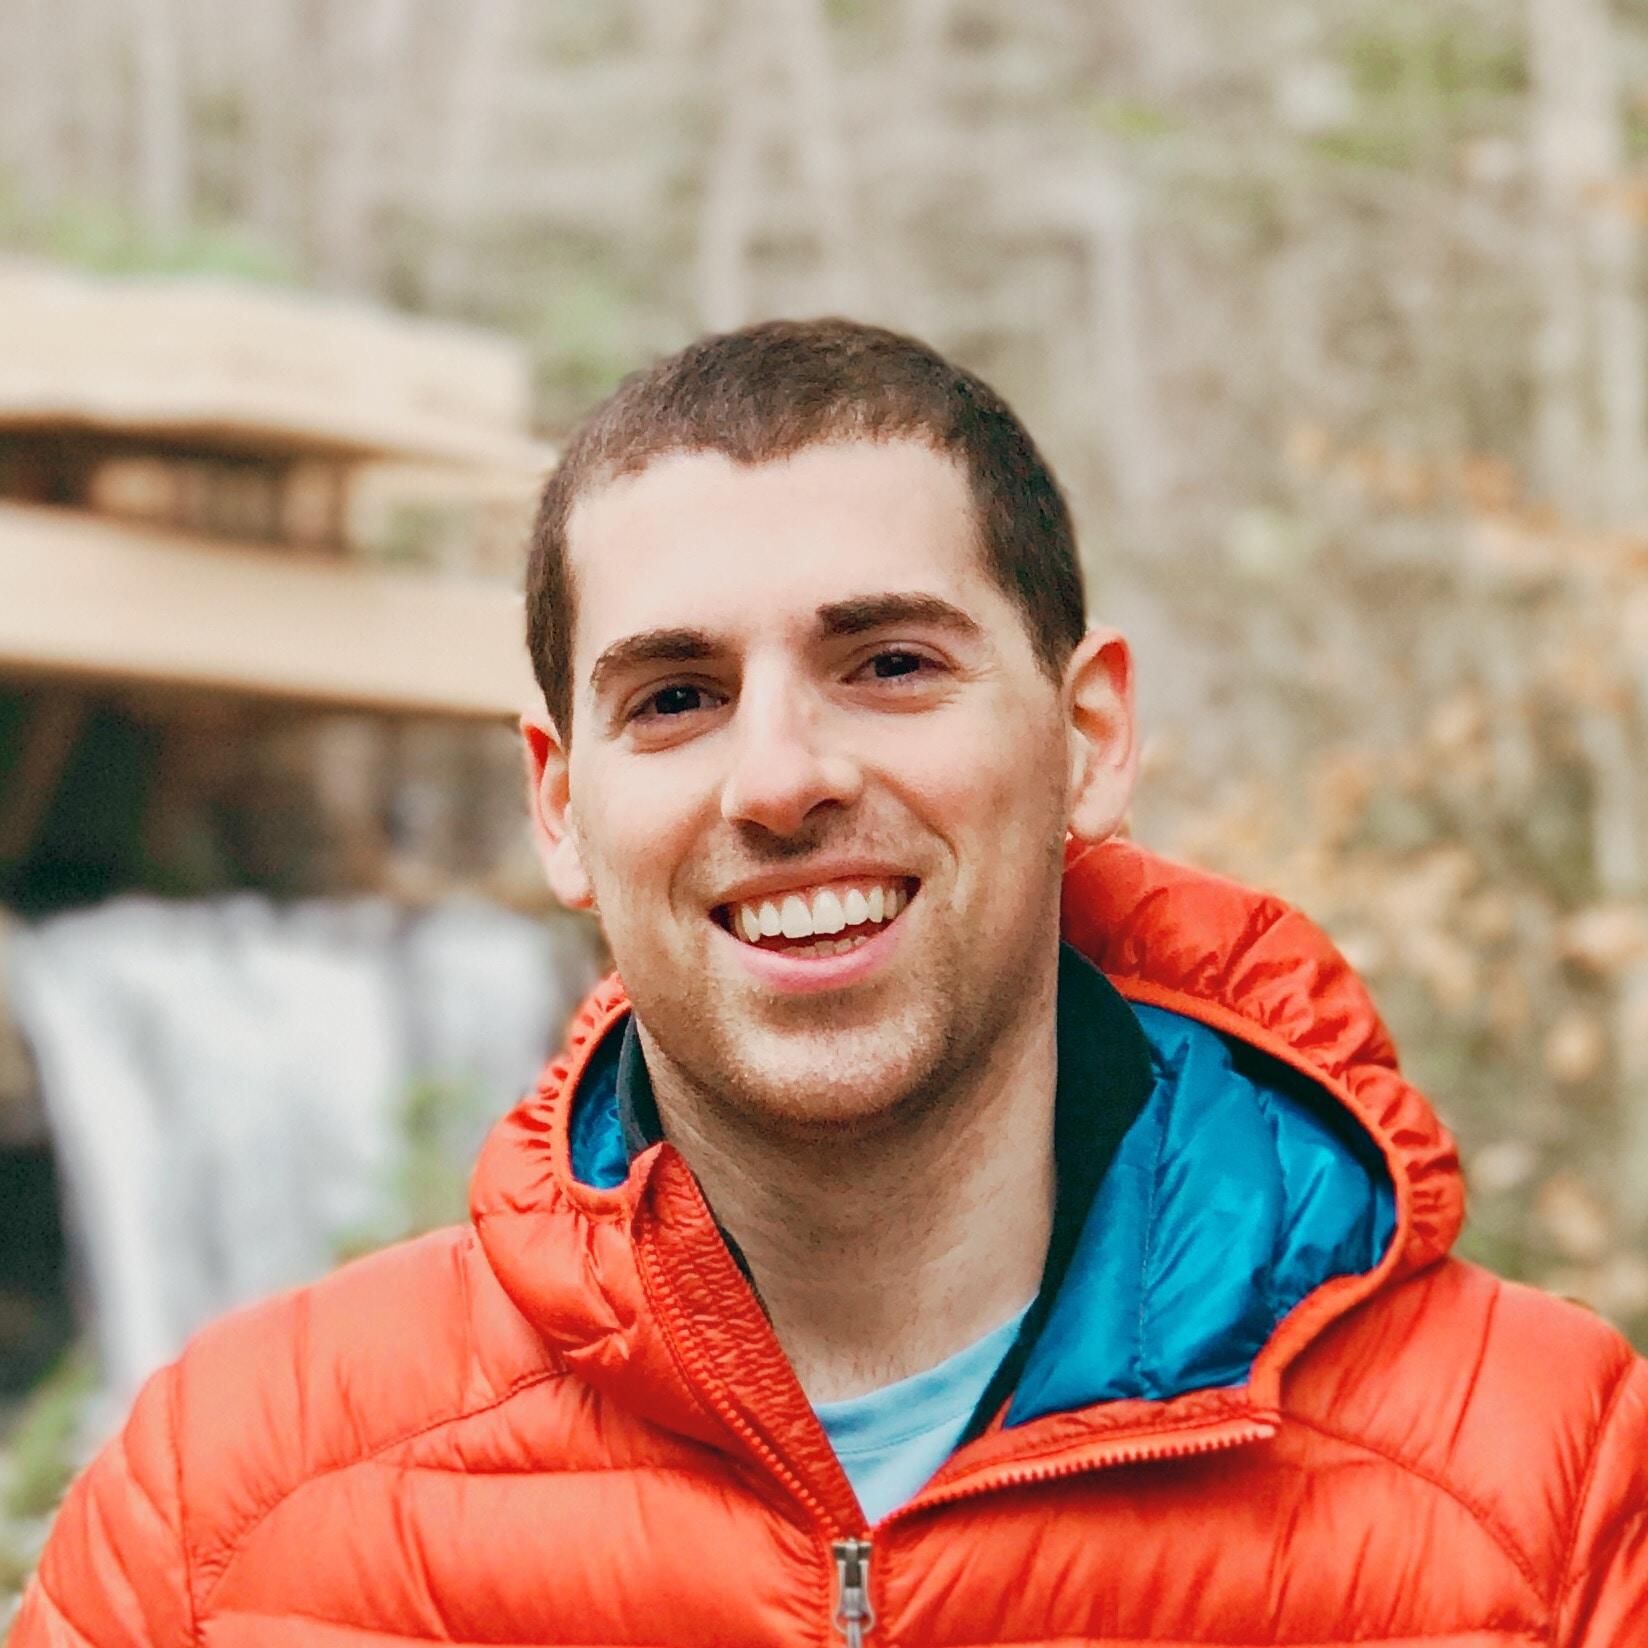 Go to Jason Weingardt's profile